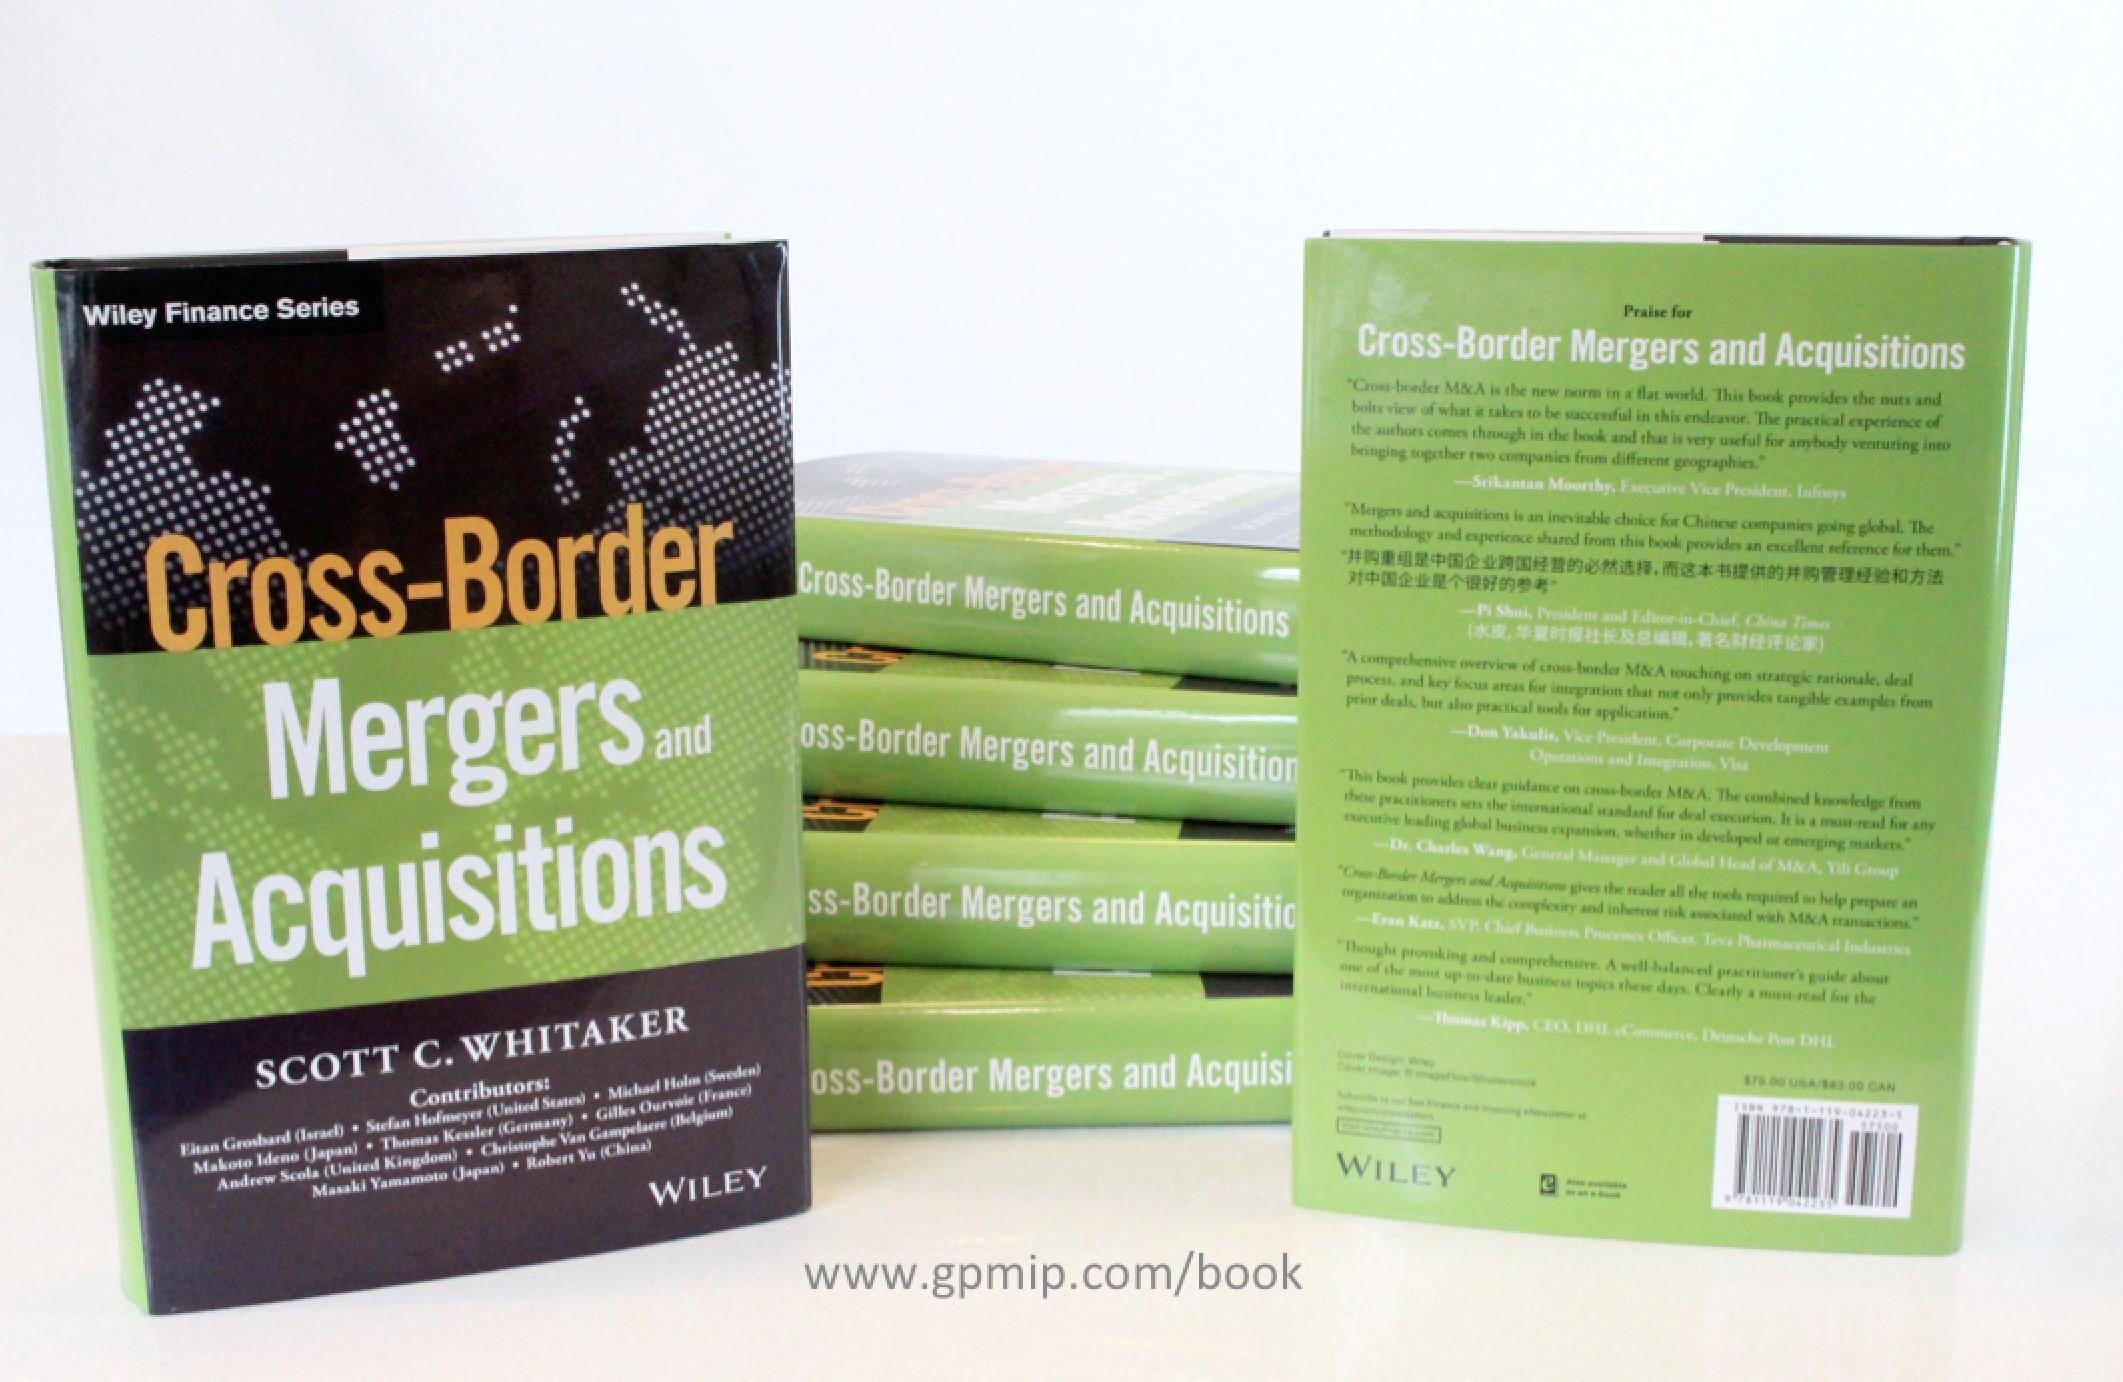 Cross-Border M&A Book